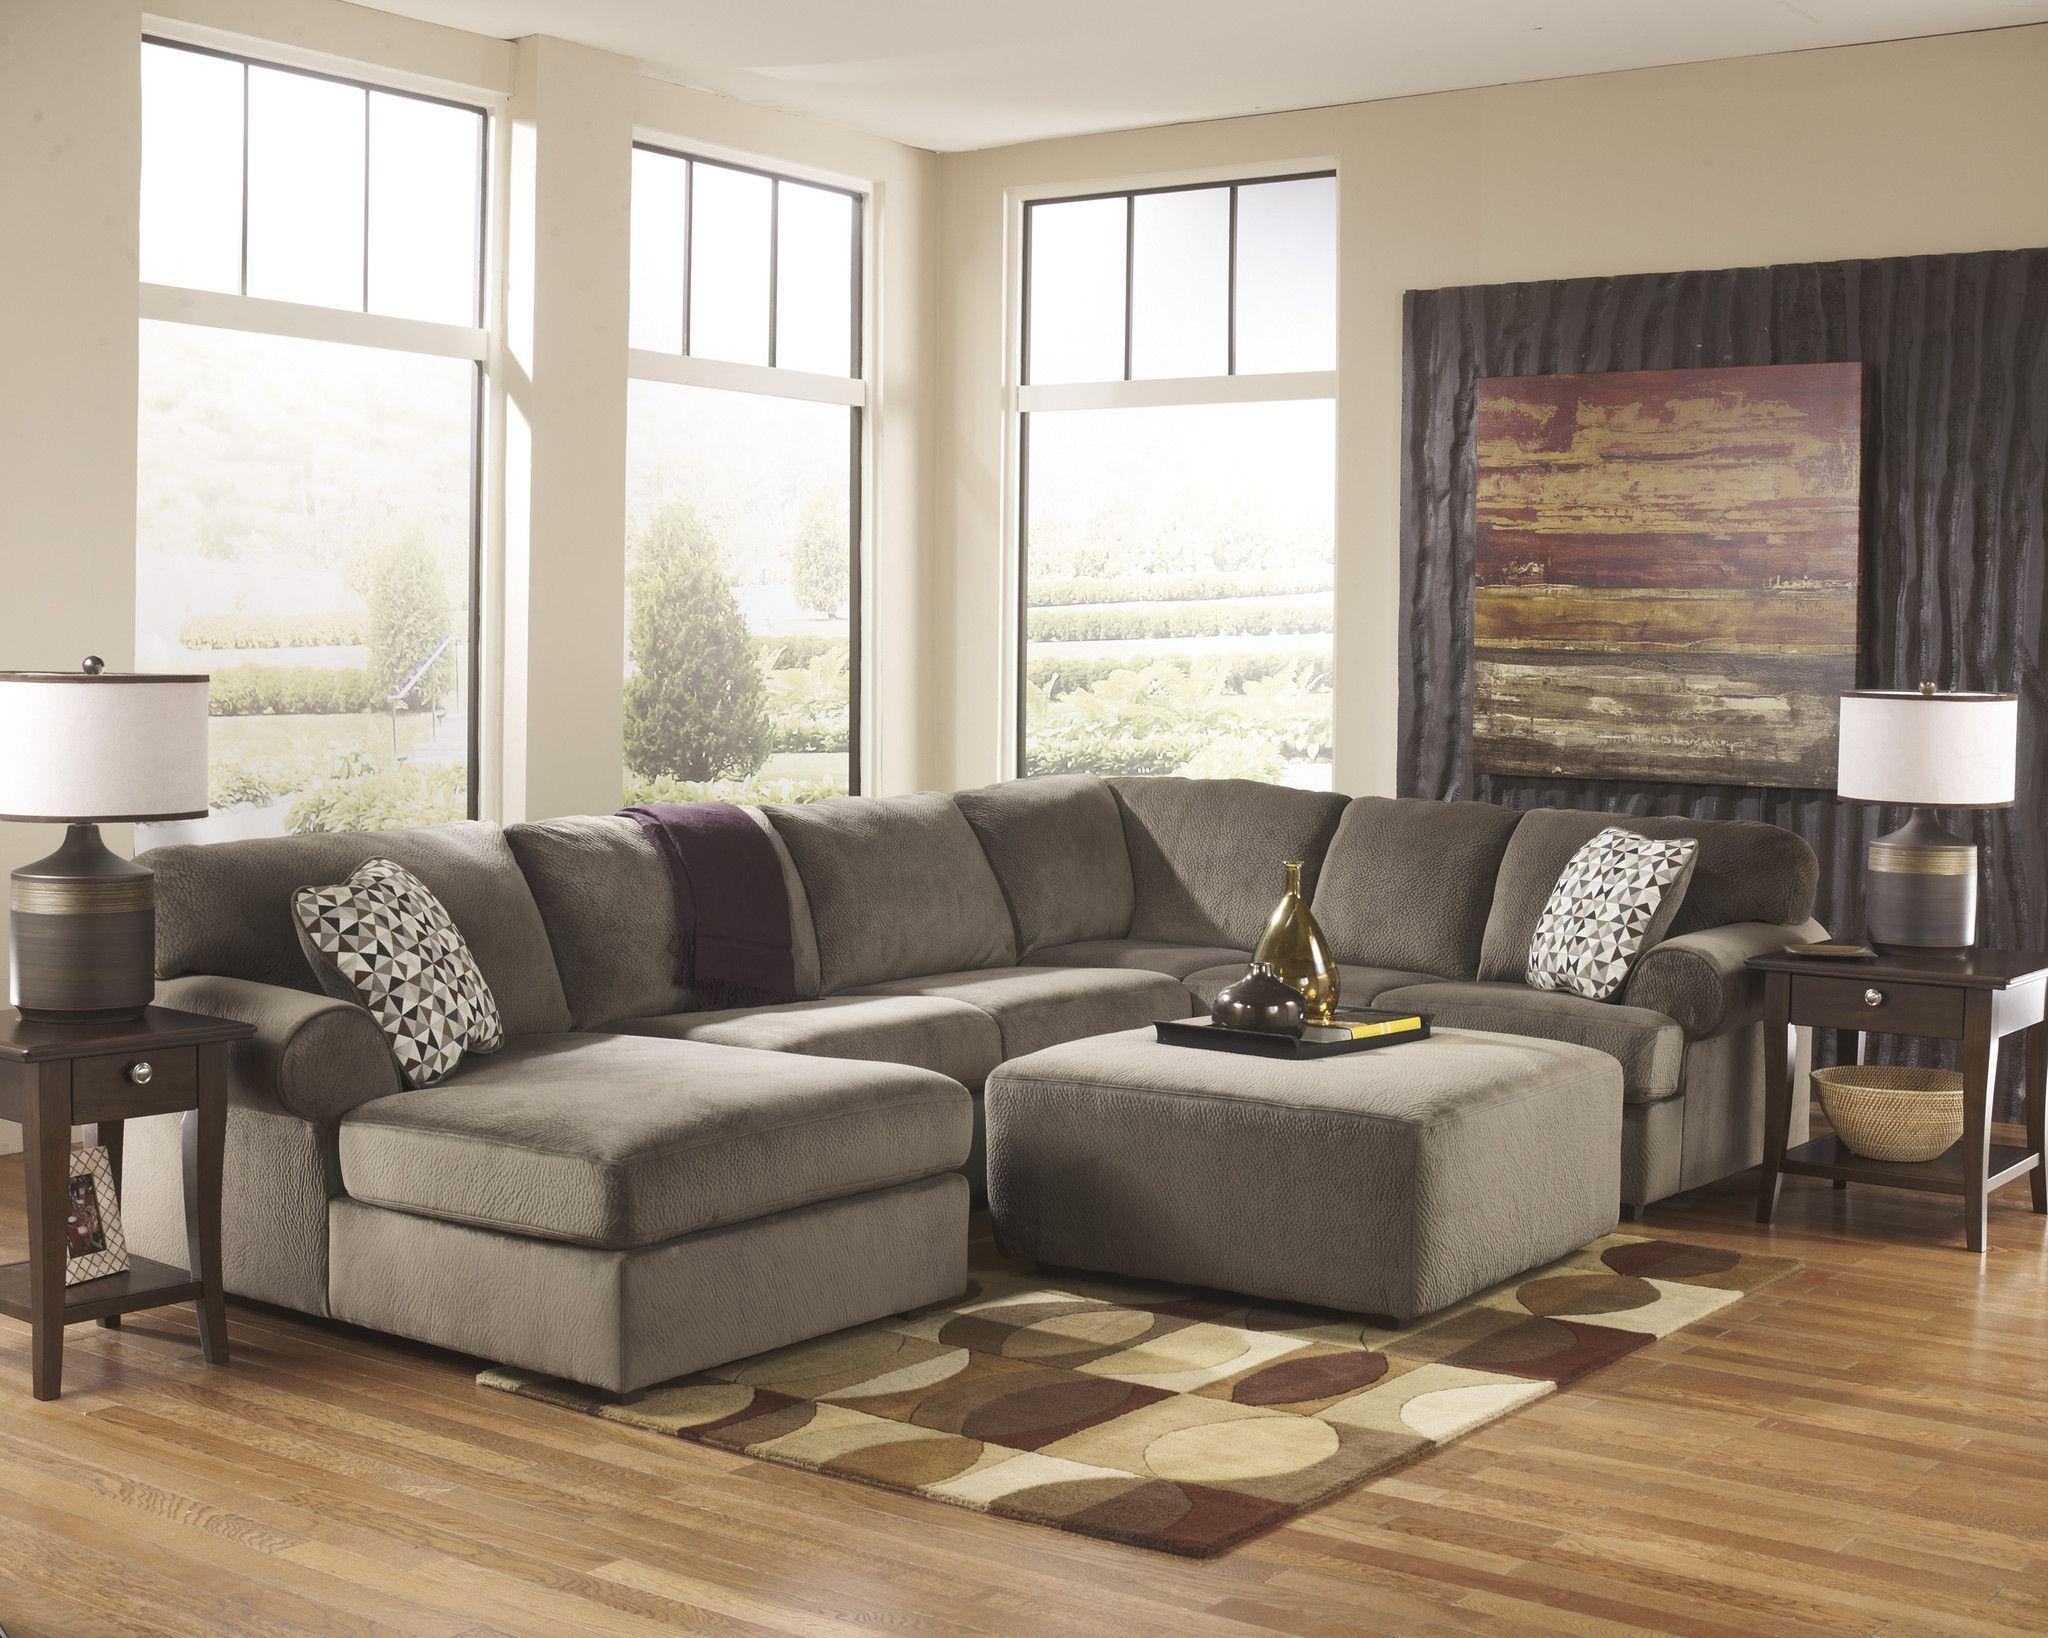 28++ Cheap living room furniture sets in atlanta ga ideas in 2021